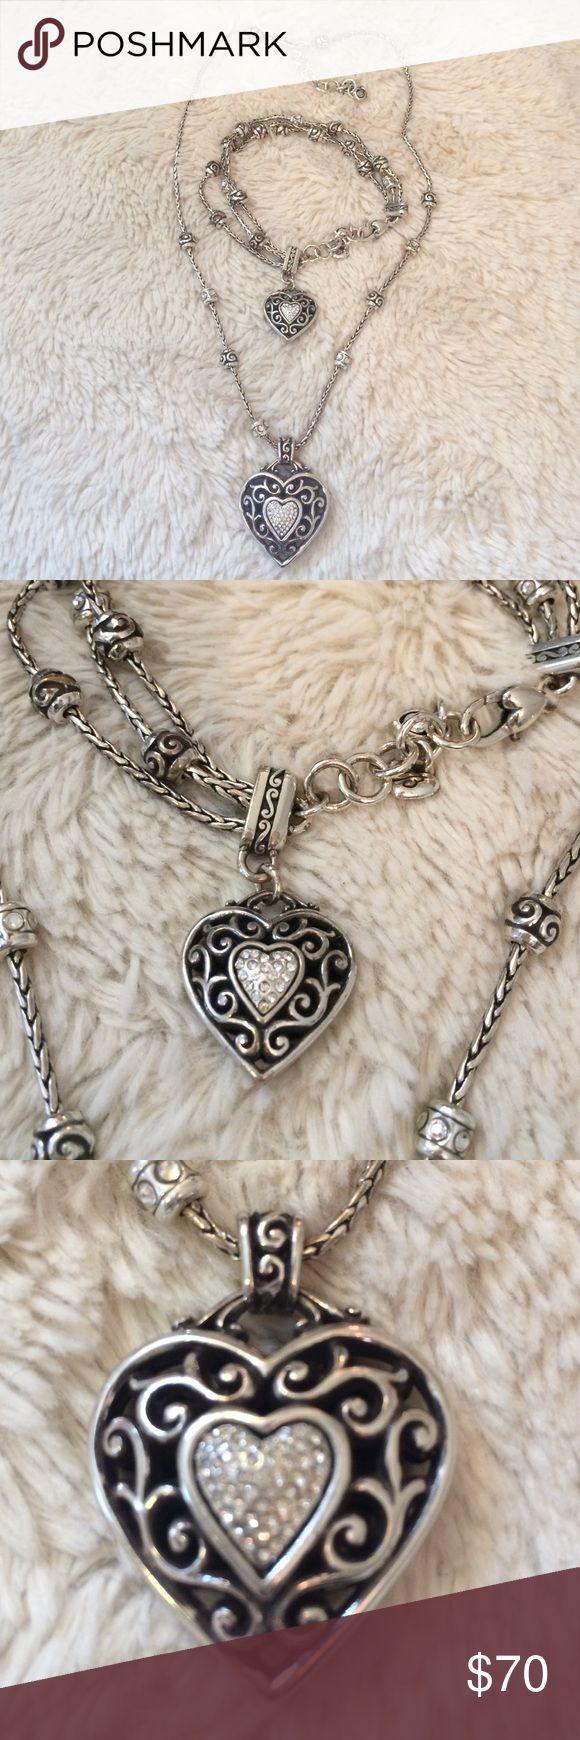 Silver Brighton Reno Heart Necklace & Bracelet Swarovski crystals. Reversible. Lobster clasp. Heart bag included❤️ Brighton Jewelry Necklaces